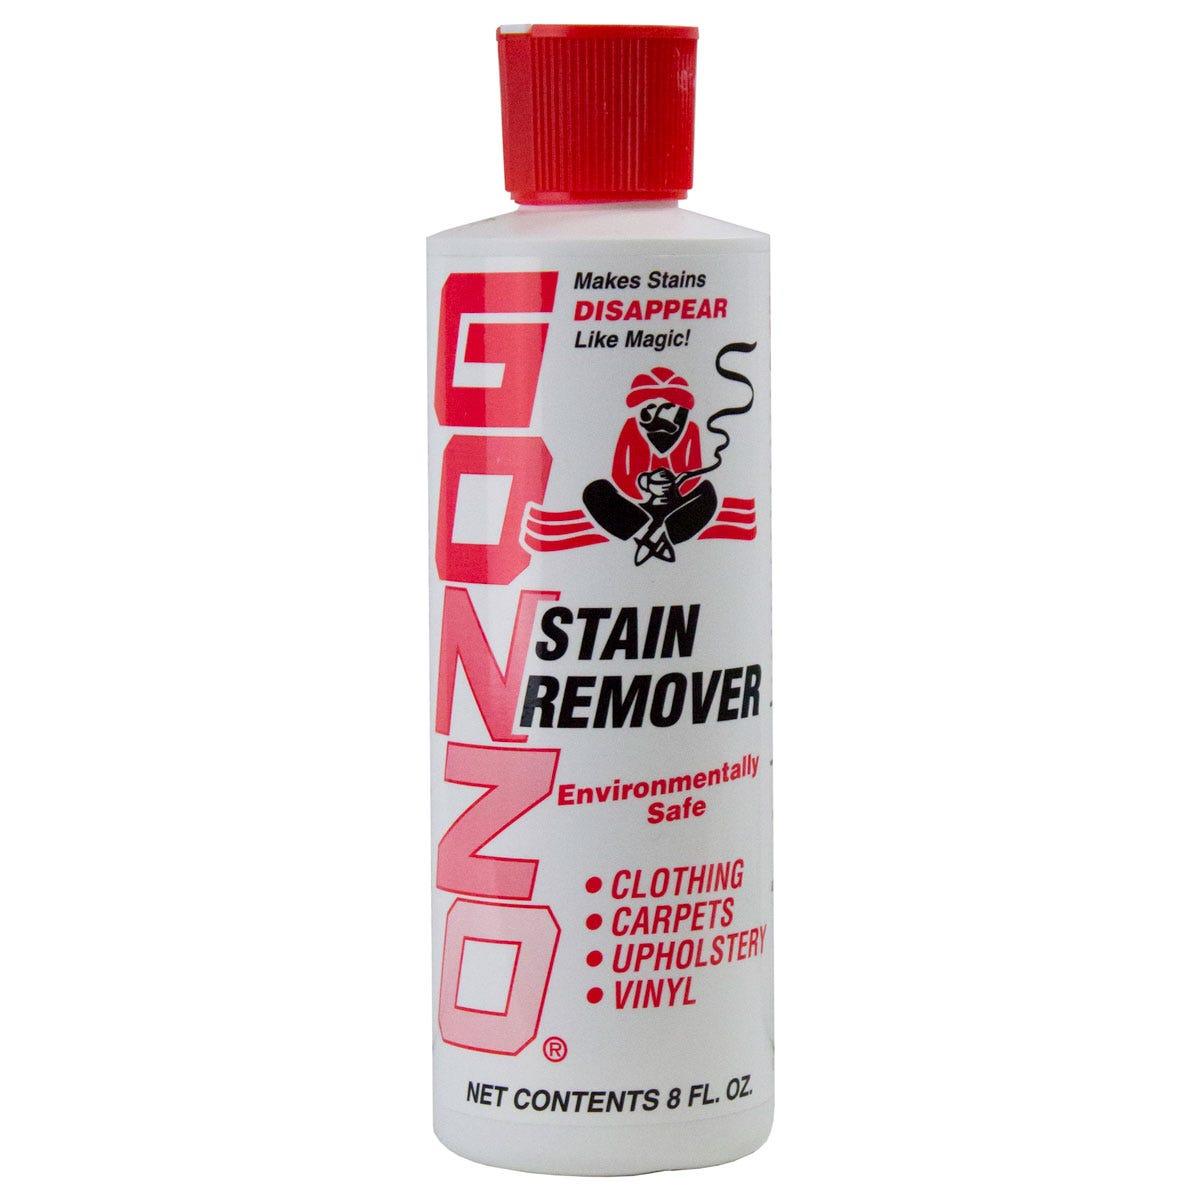 https://googone.com/media/catalog/product/g/o/gonzo-stain-remover_front_1_6.jpg